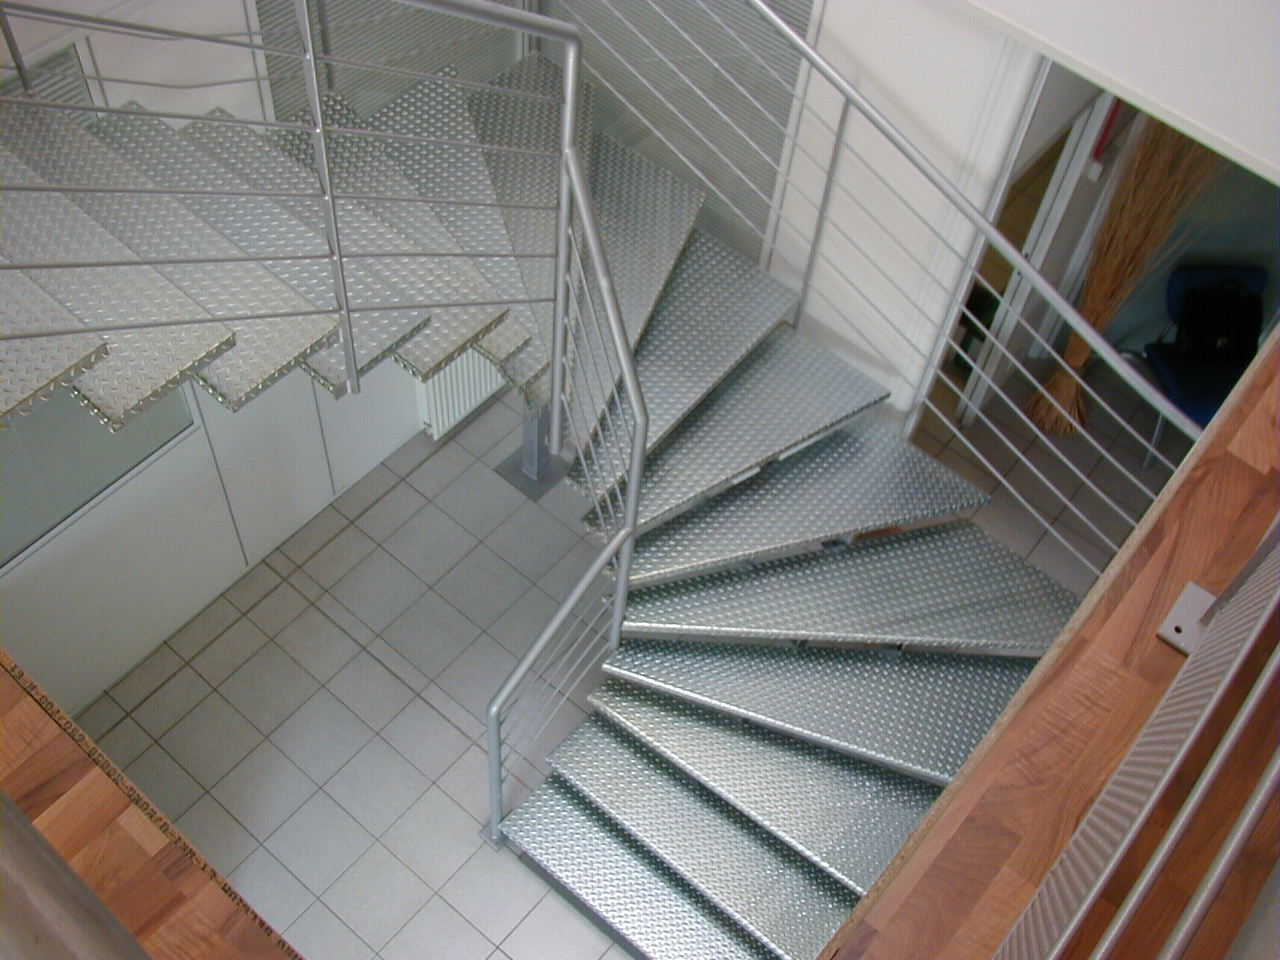 pose carrelage escalier tournant great type duescalier with pose carrelage escalier tournant. Black Bedroom Furniture Sets. Home Design Ideas